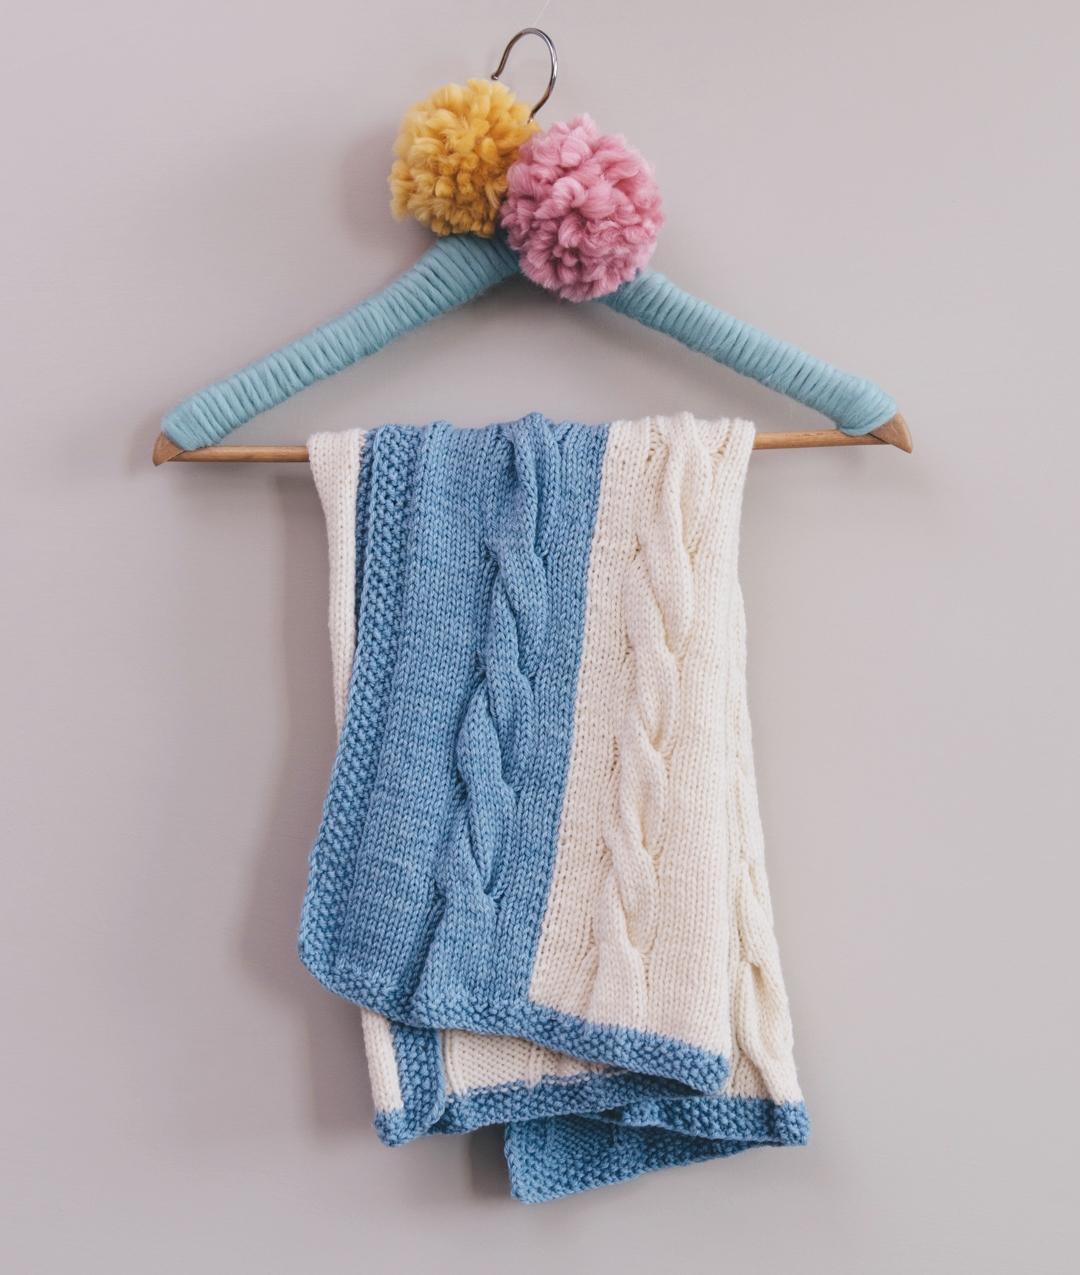 Baby - WoolBaby - Wool - NAPOLEONE BABYBLANKET - 1